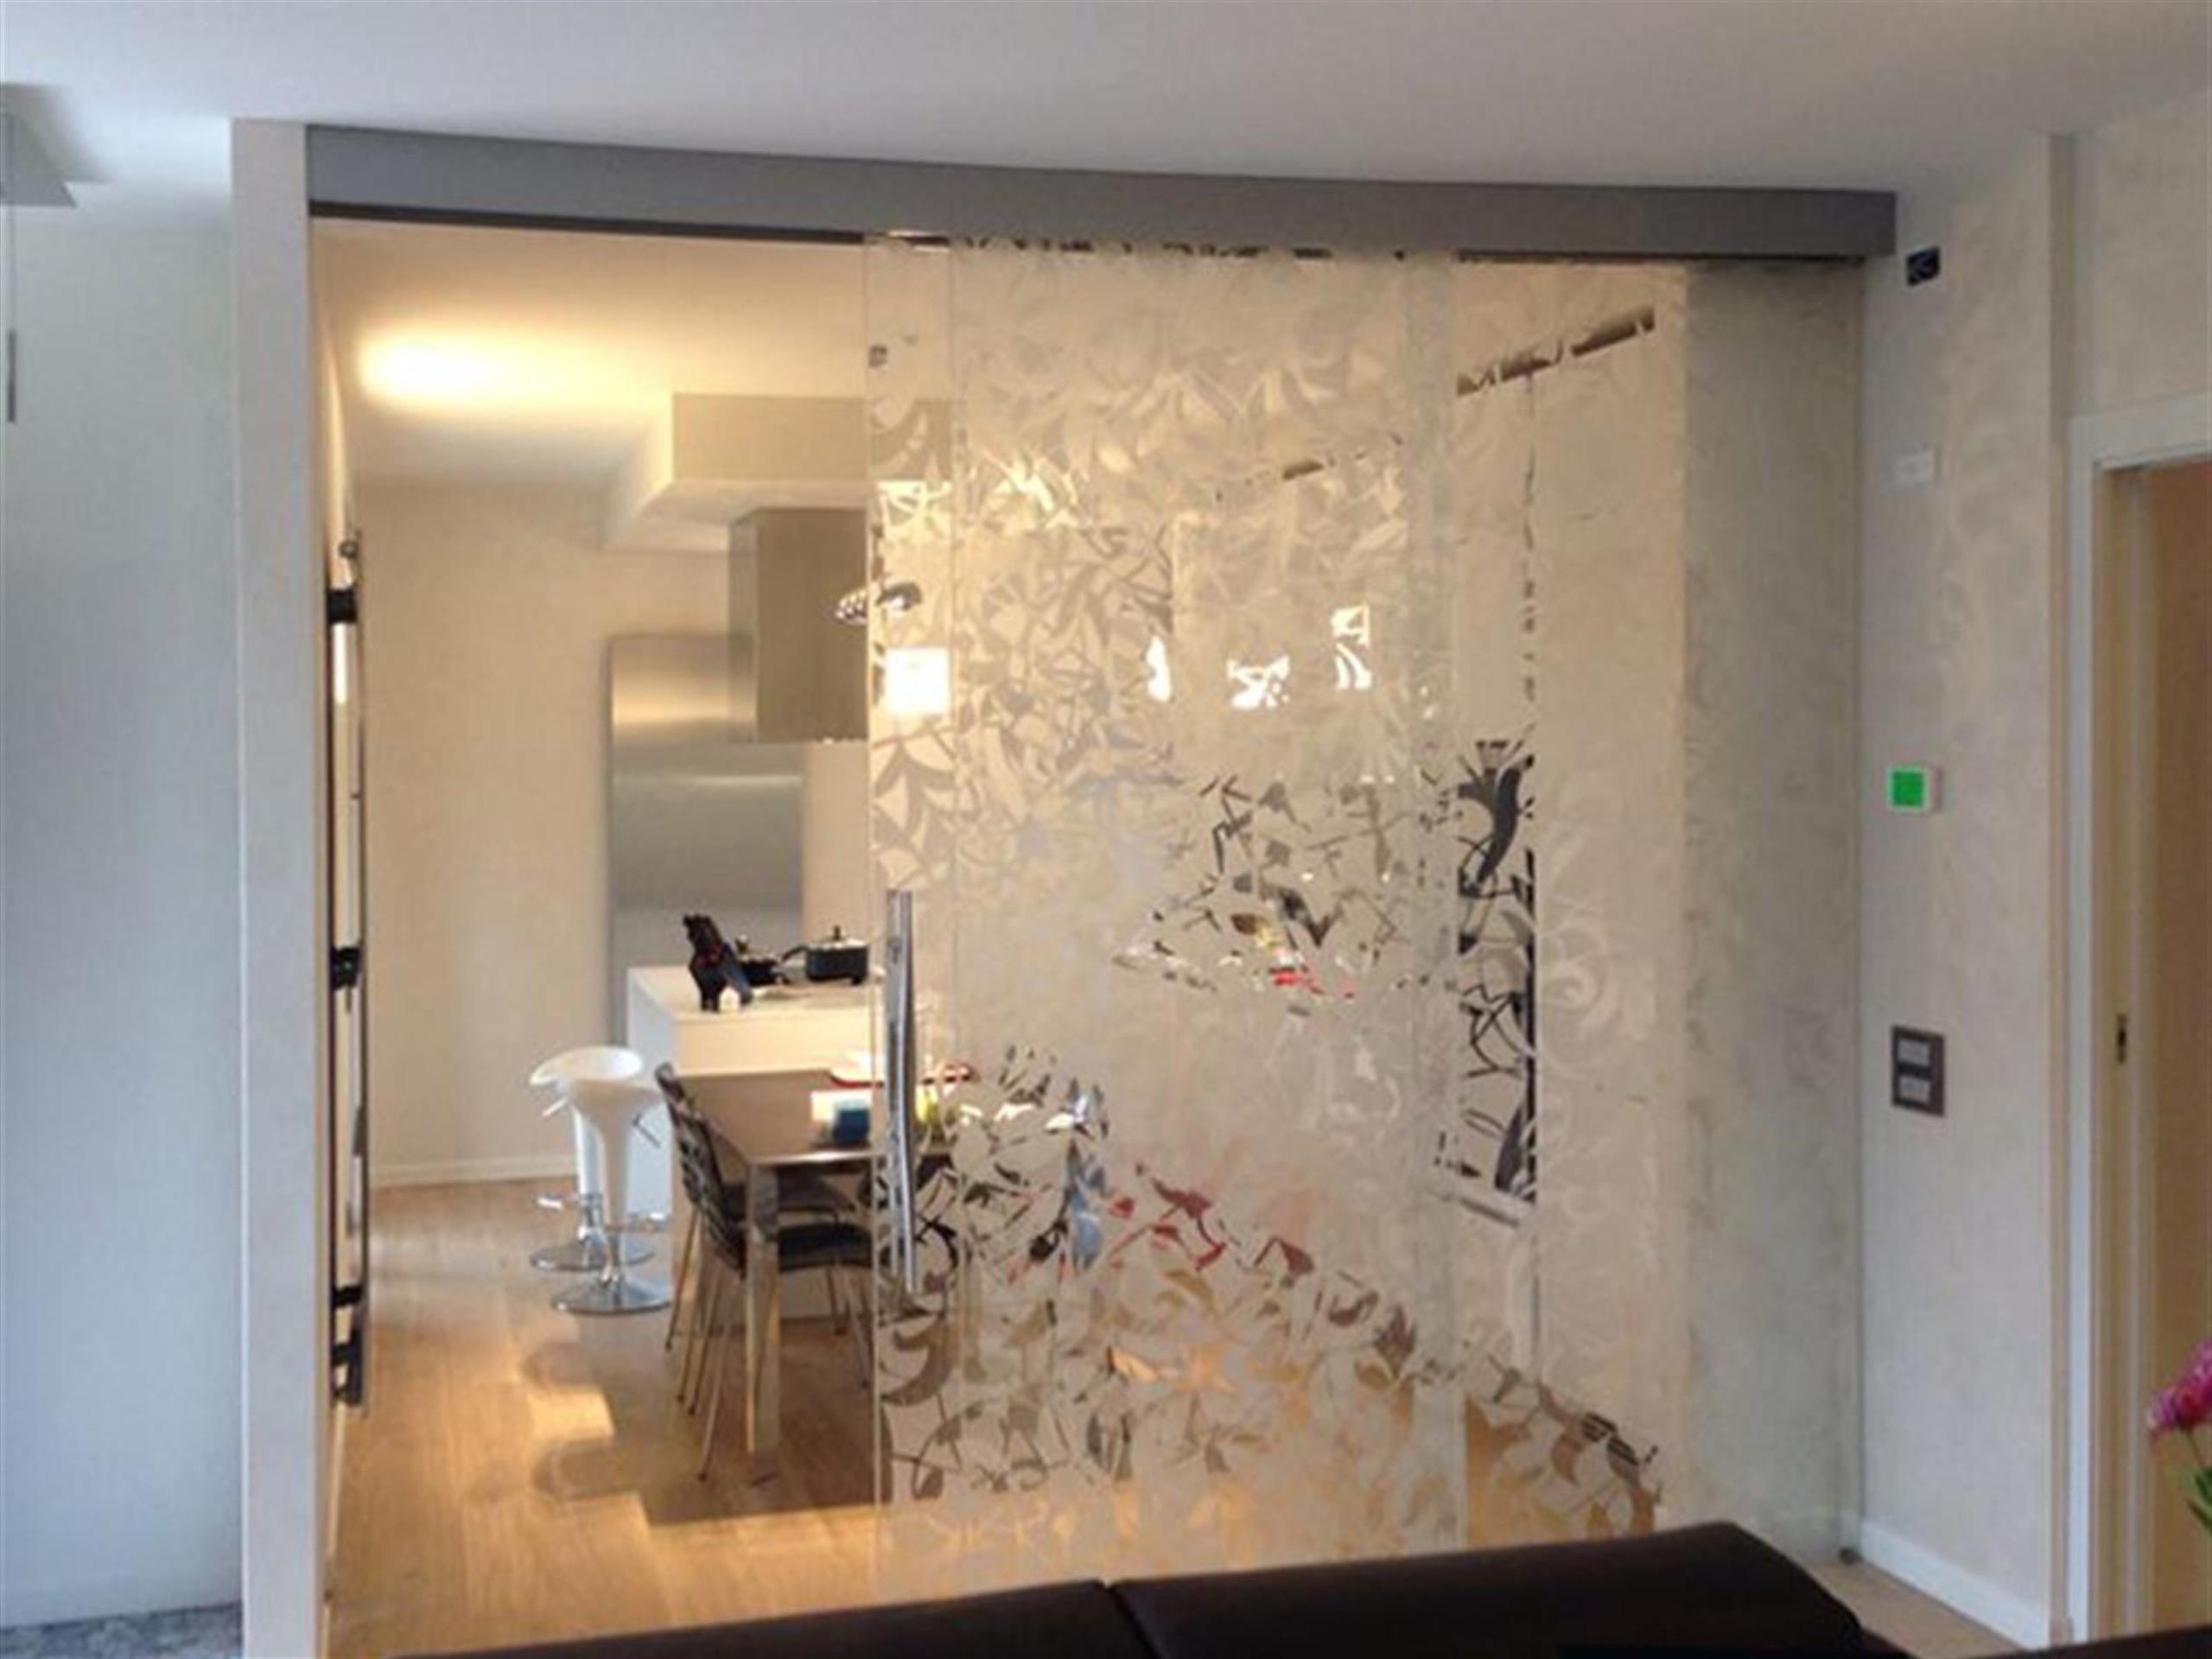 Stunning Porta Scorrevole Cucina Gallery - Embercreative.us ...